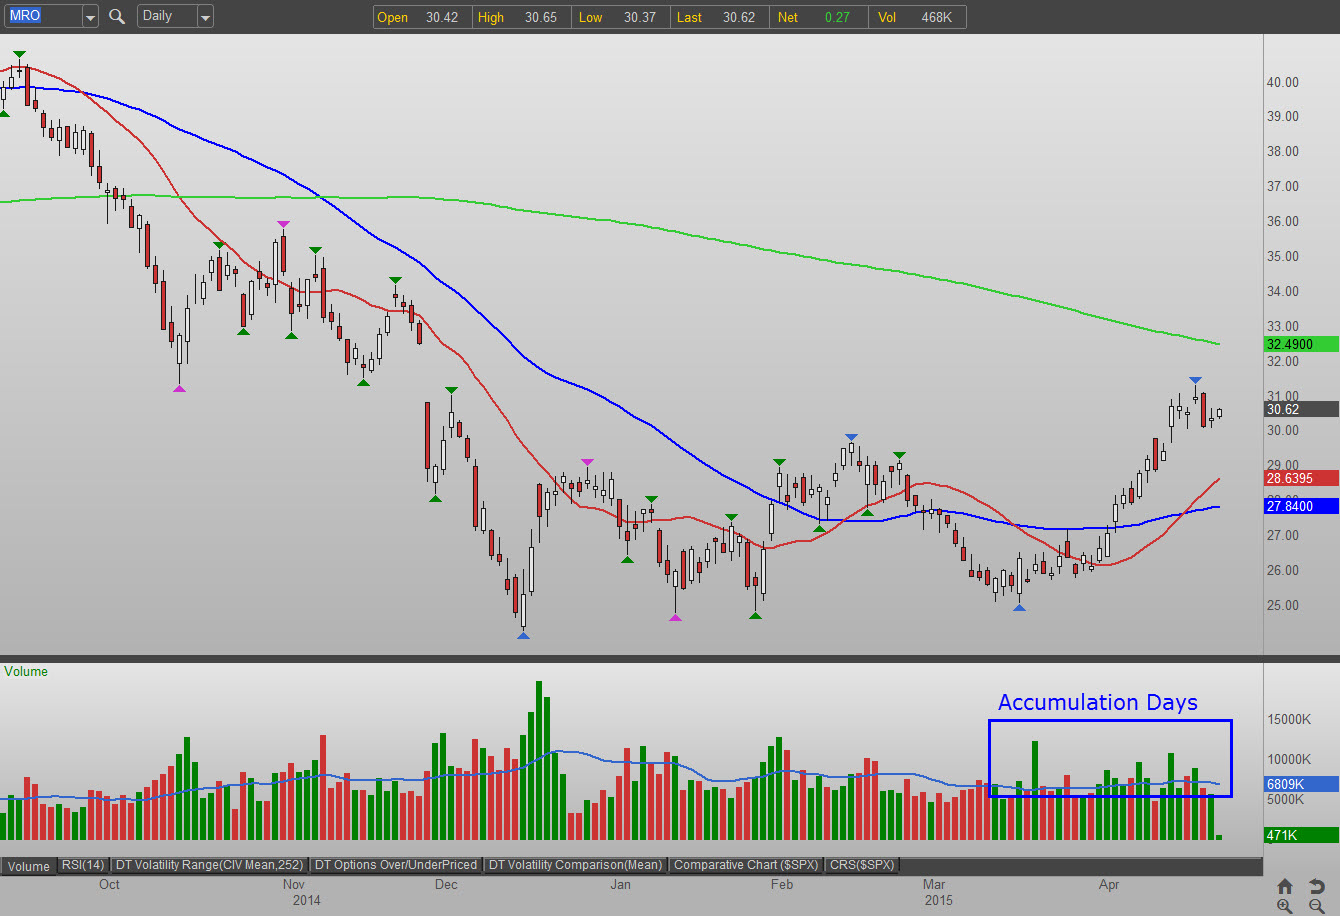 Mro stock options